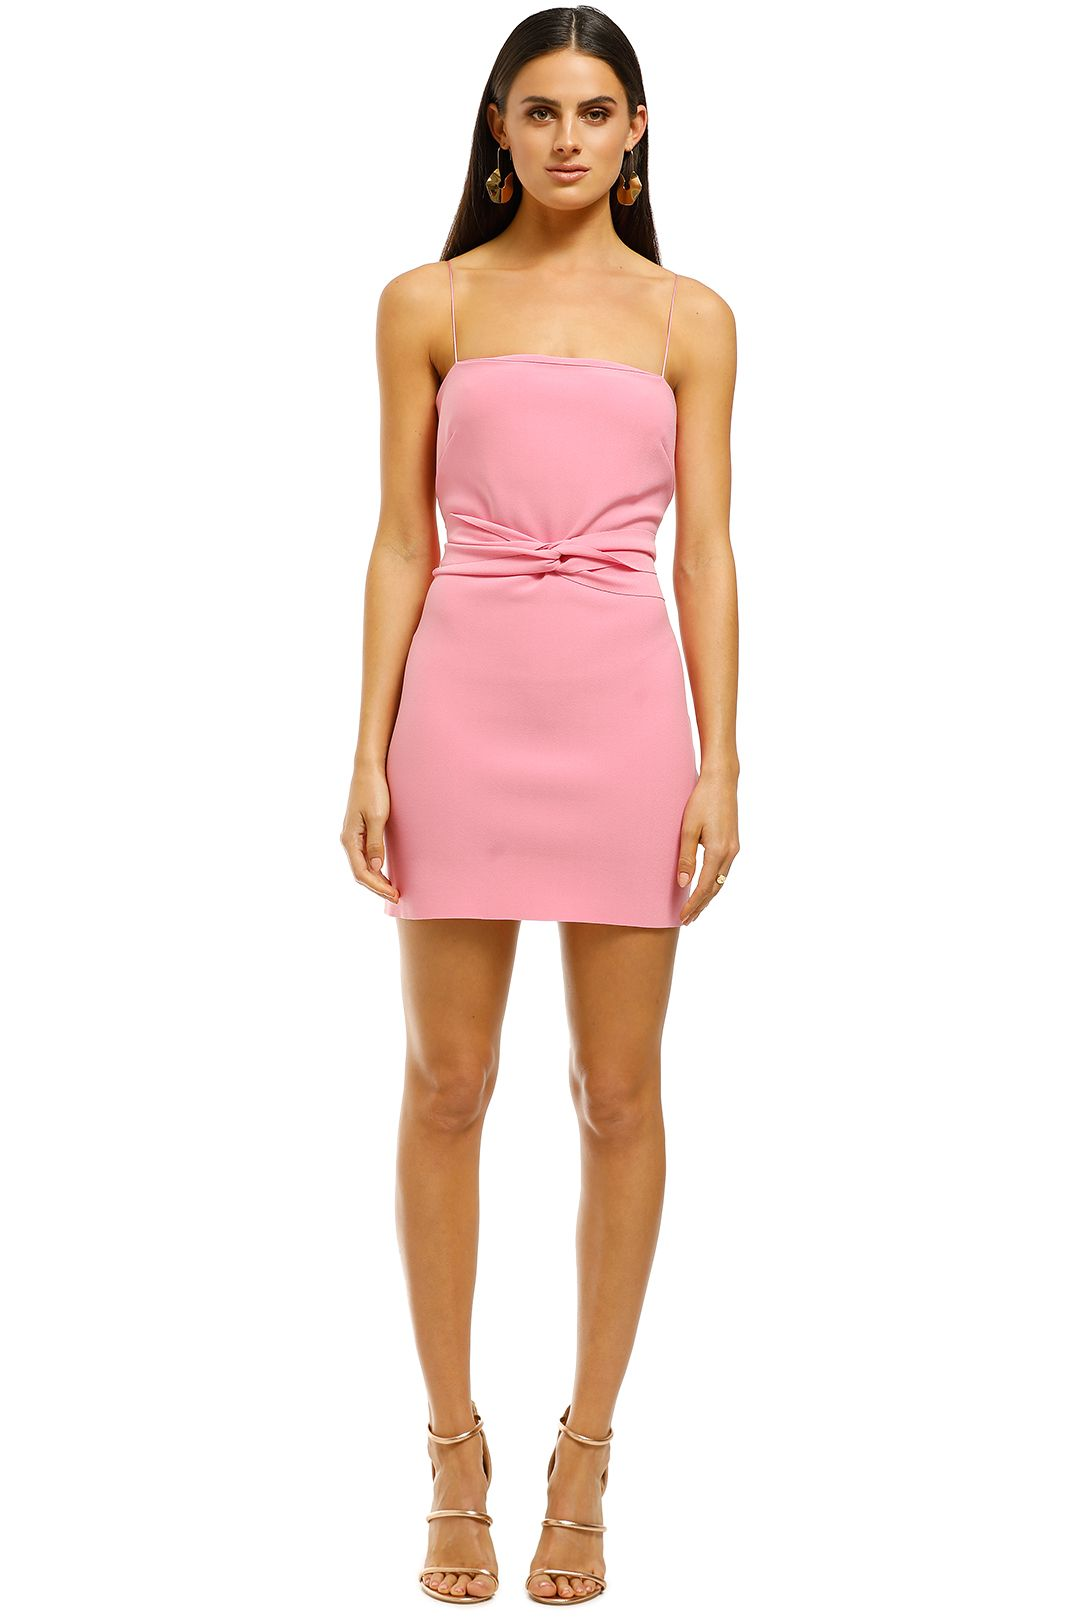 Bec+Bridge-Alexandra-Mini-Dress-Front